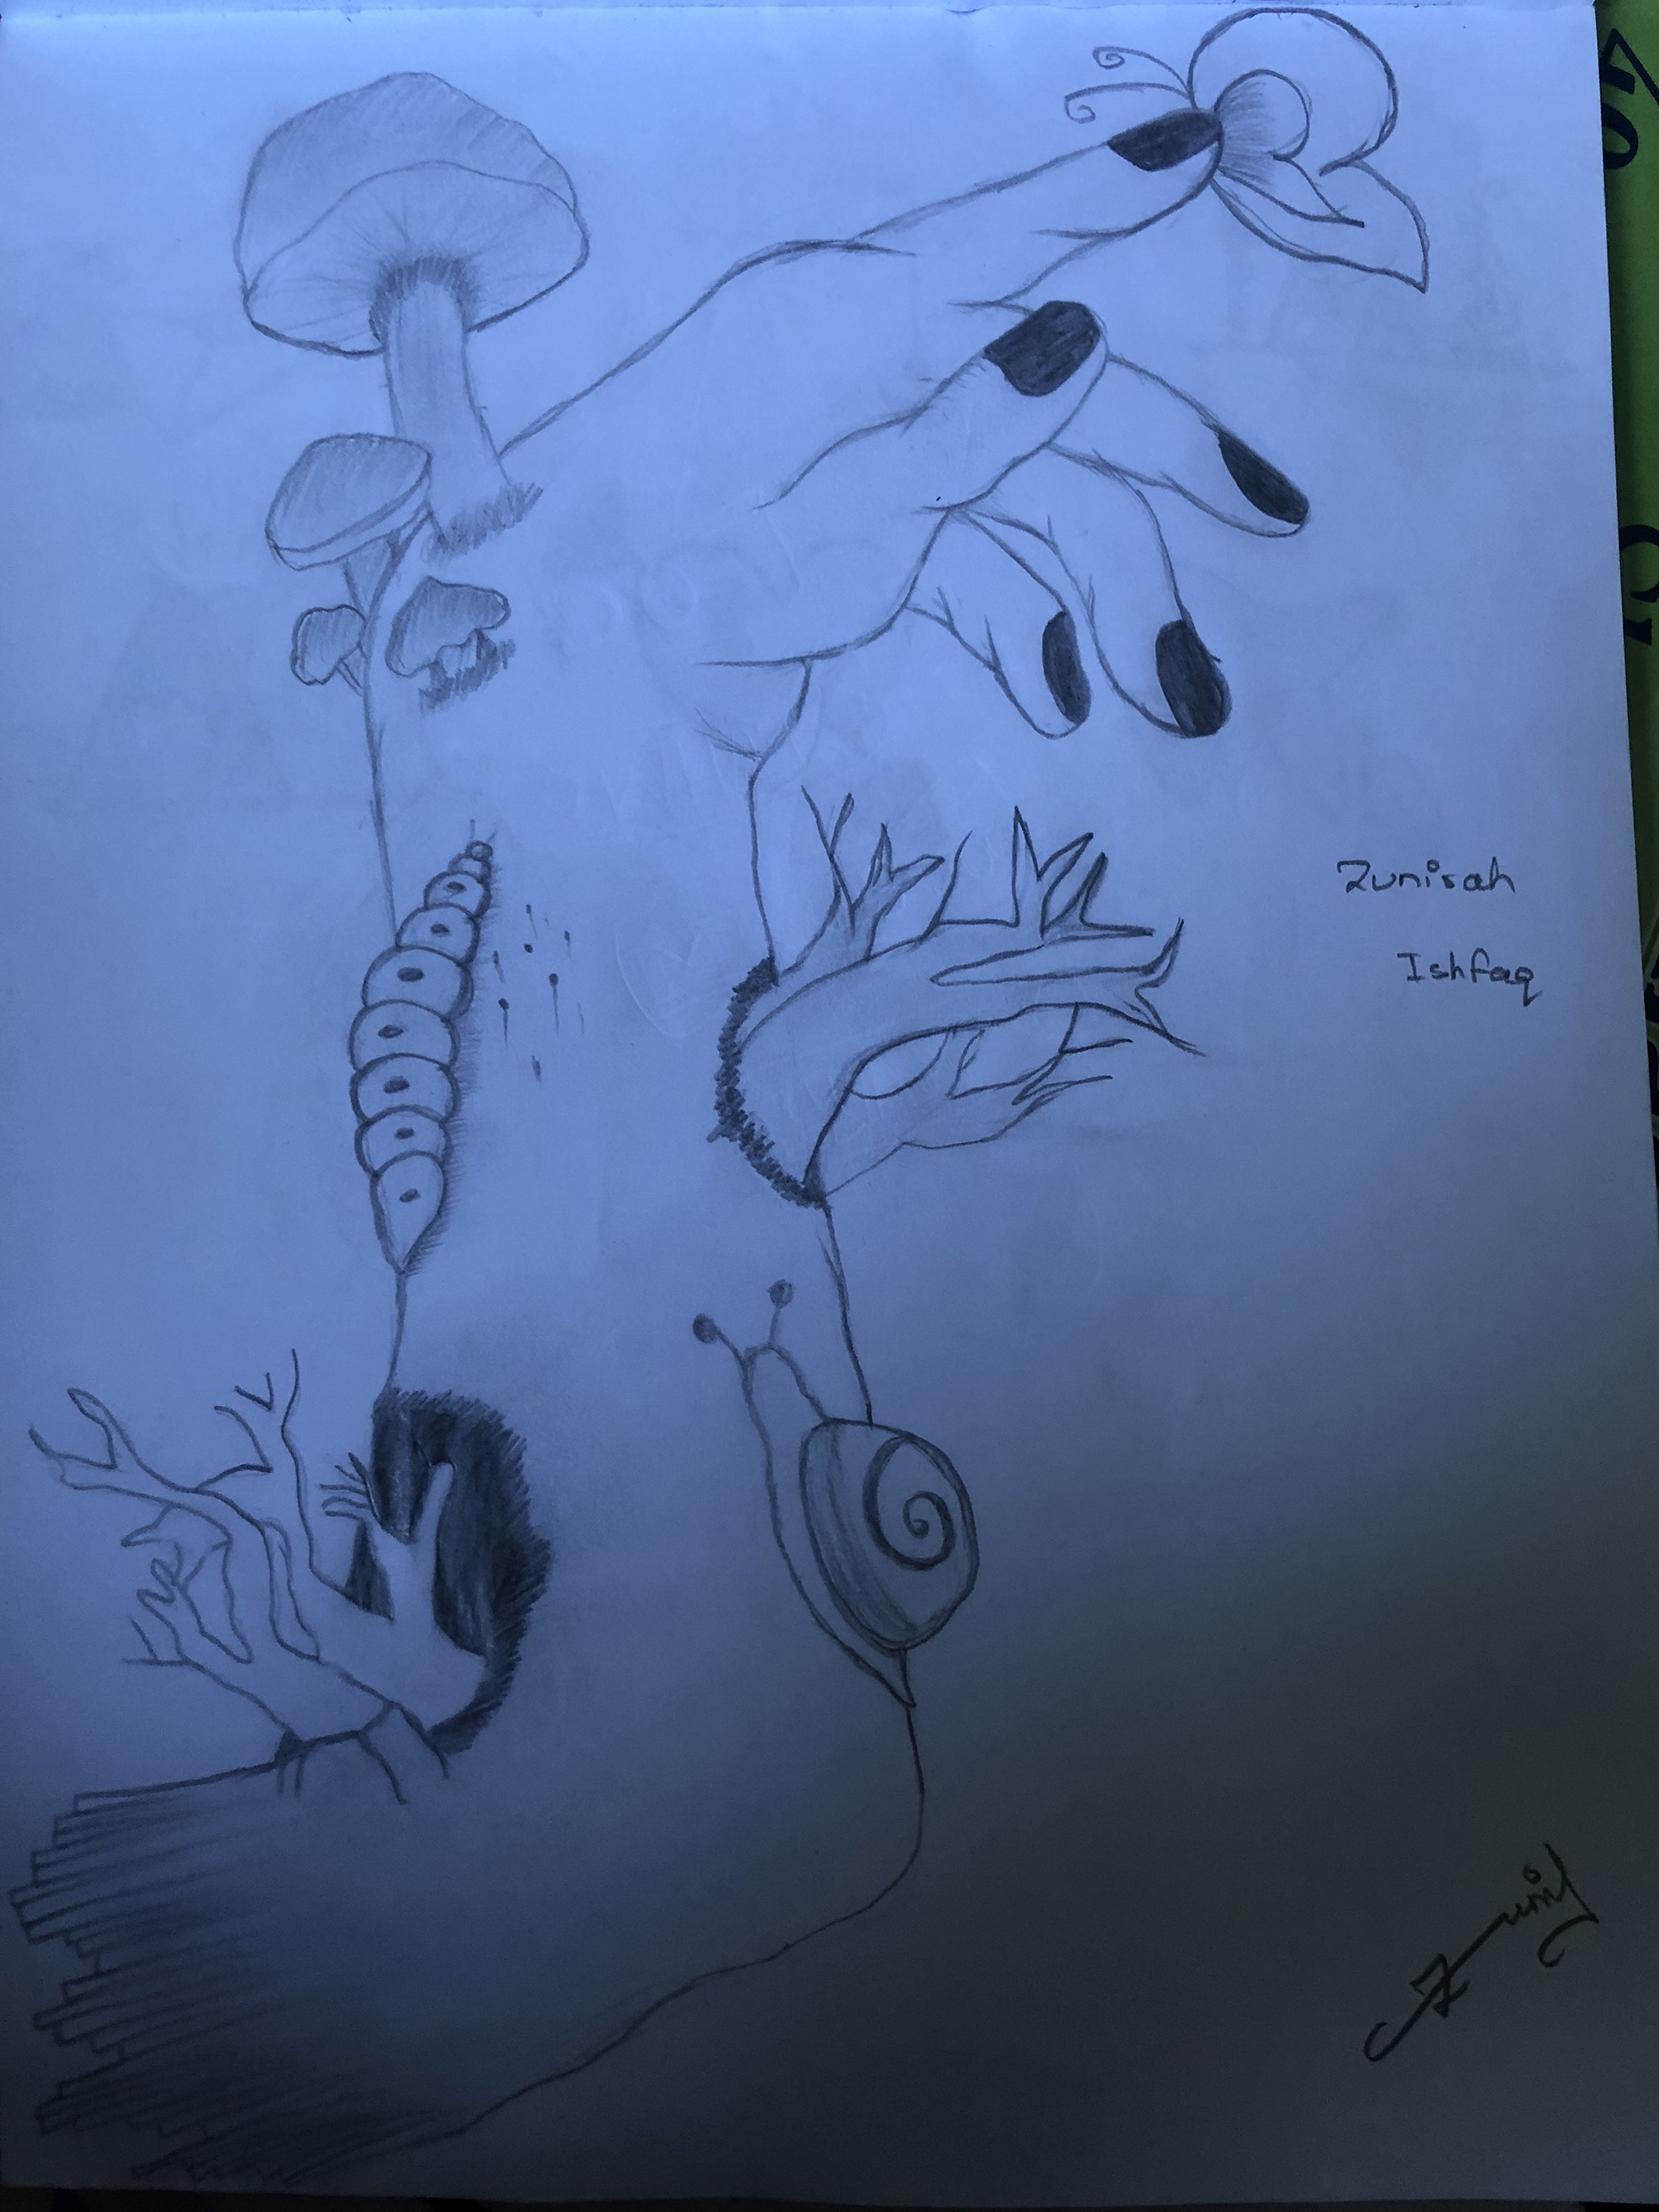 1st. Zunirah Ishfaq, Drawing #3